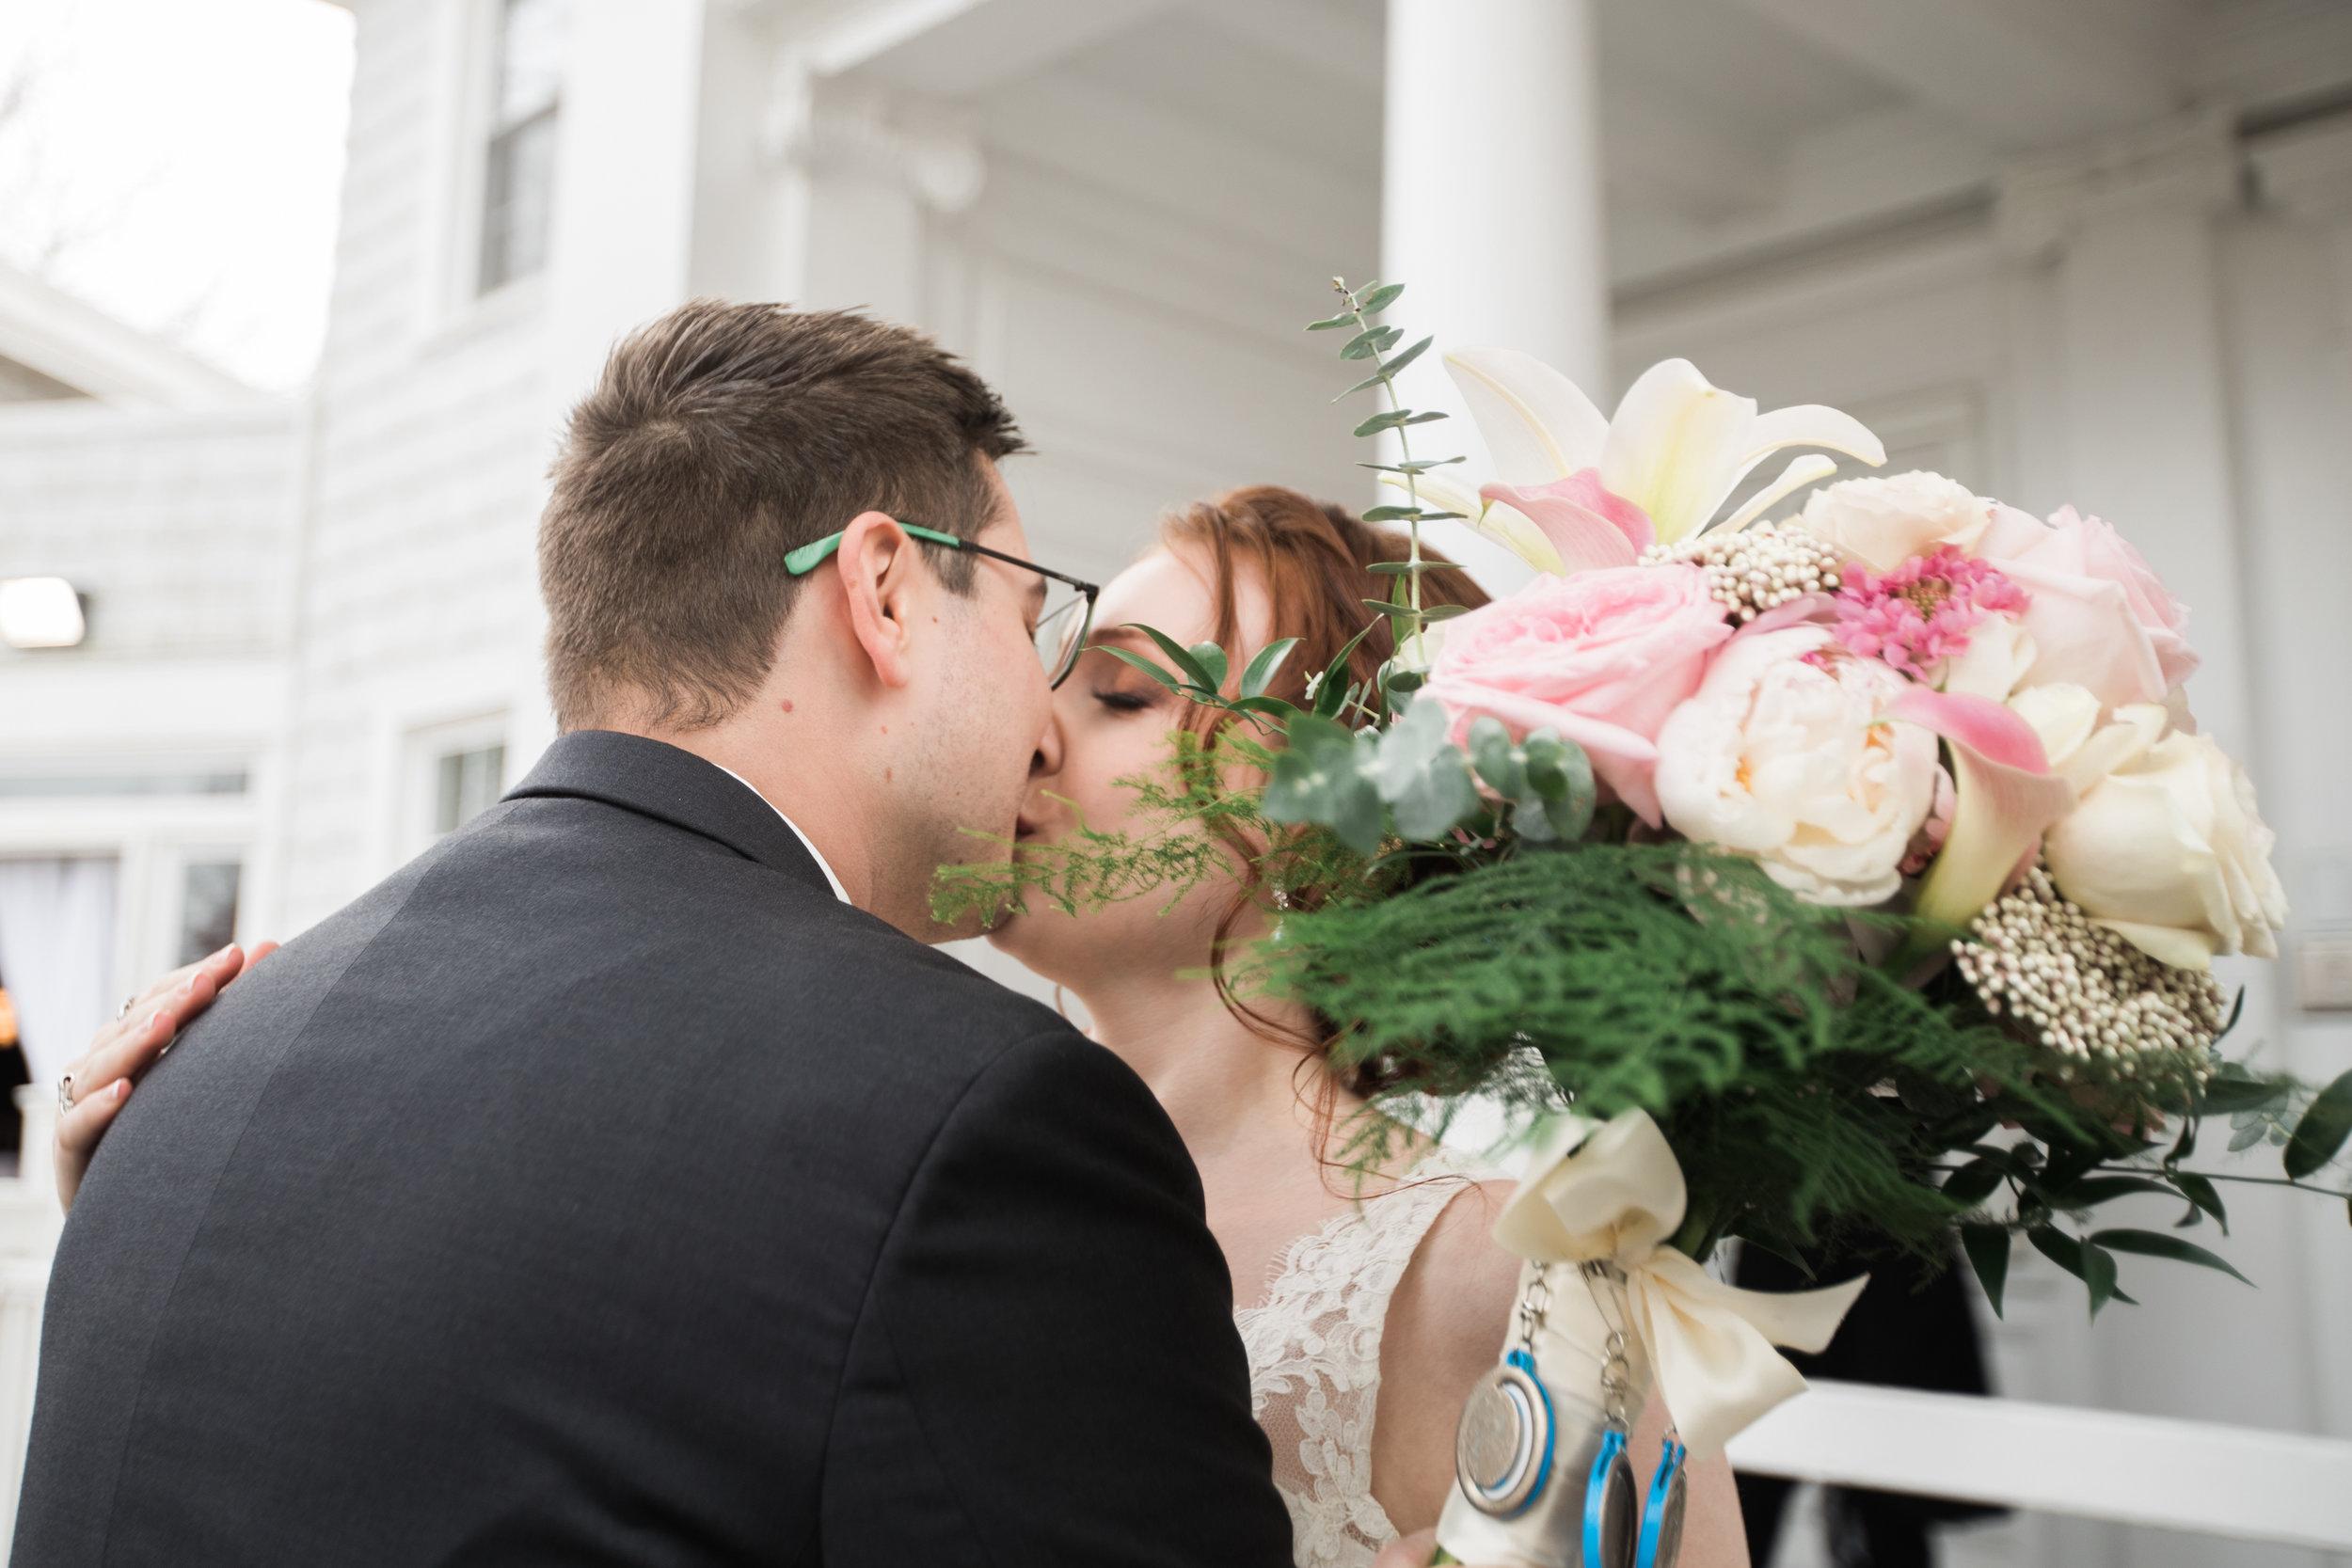 Harry Potter Wedding at Overhills Mansion Catonville Maryland Wedding Photographers Megapixels Media (39 of 134).jpg